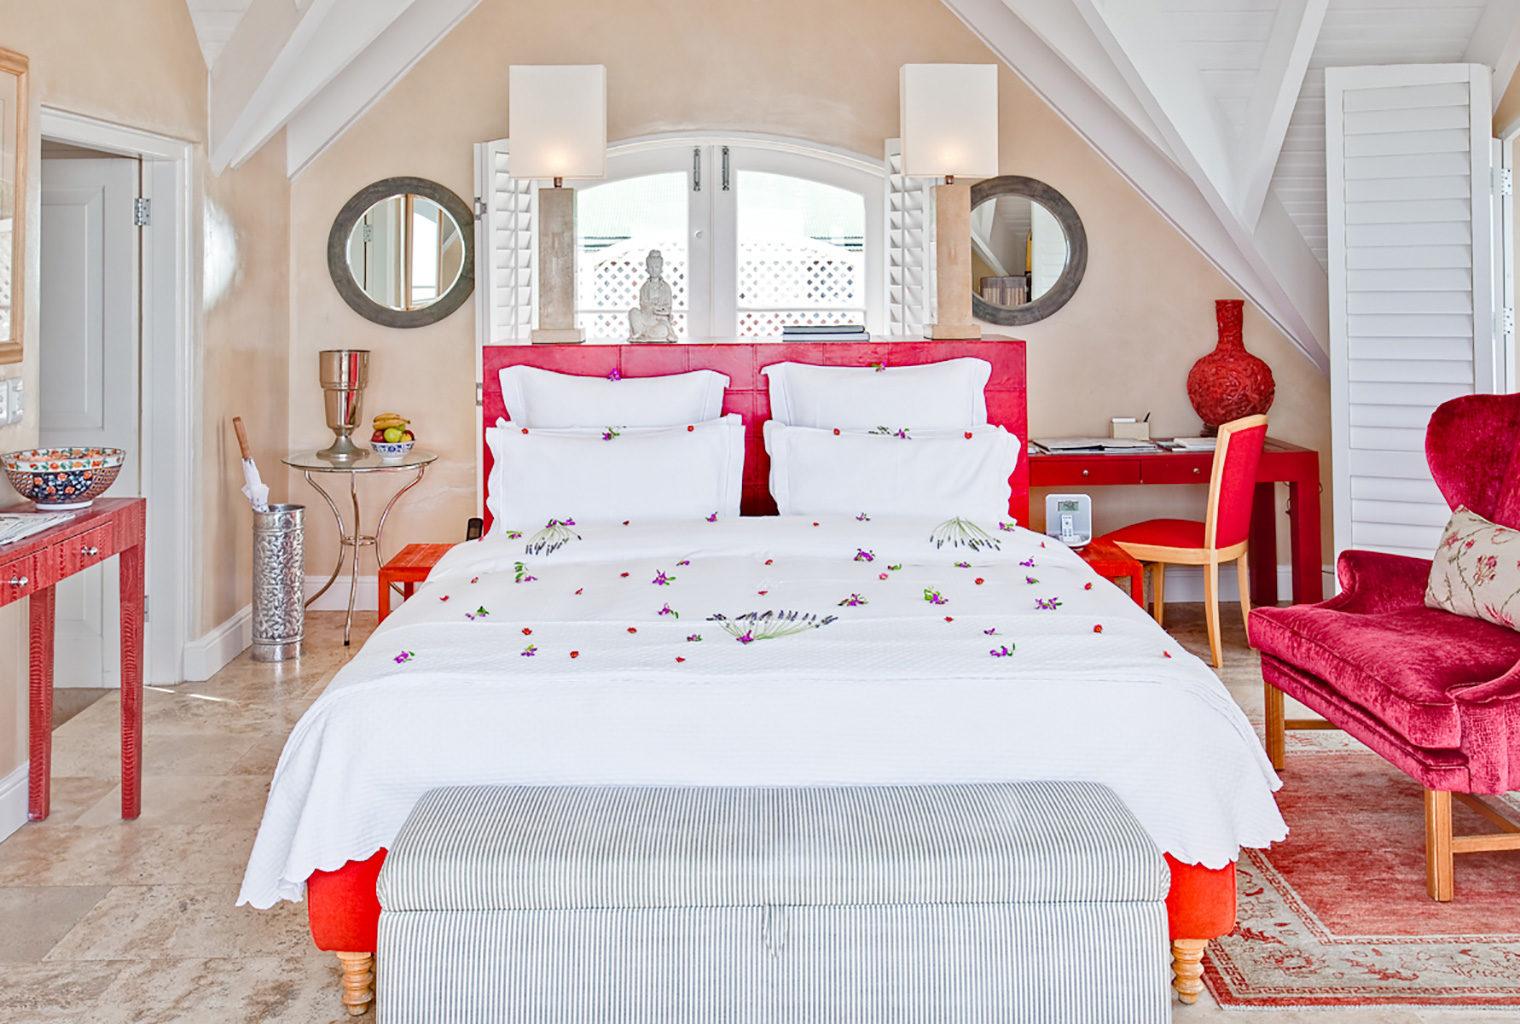 Birkenhead-House-South-Africa-Bedroom